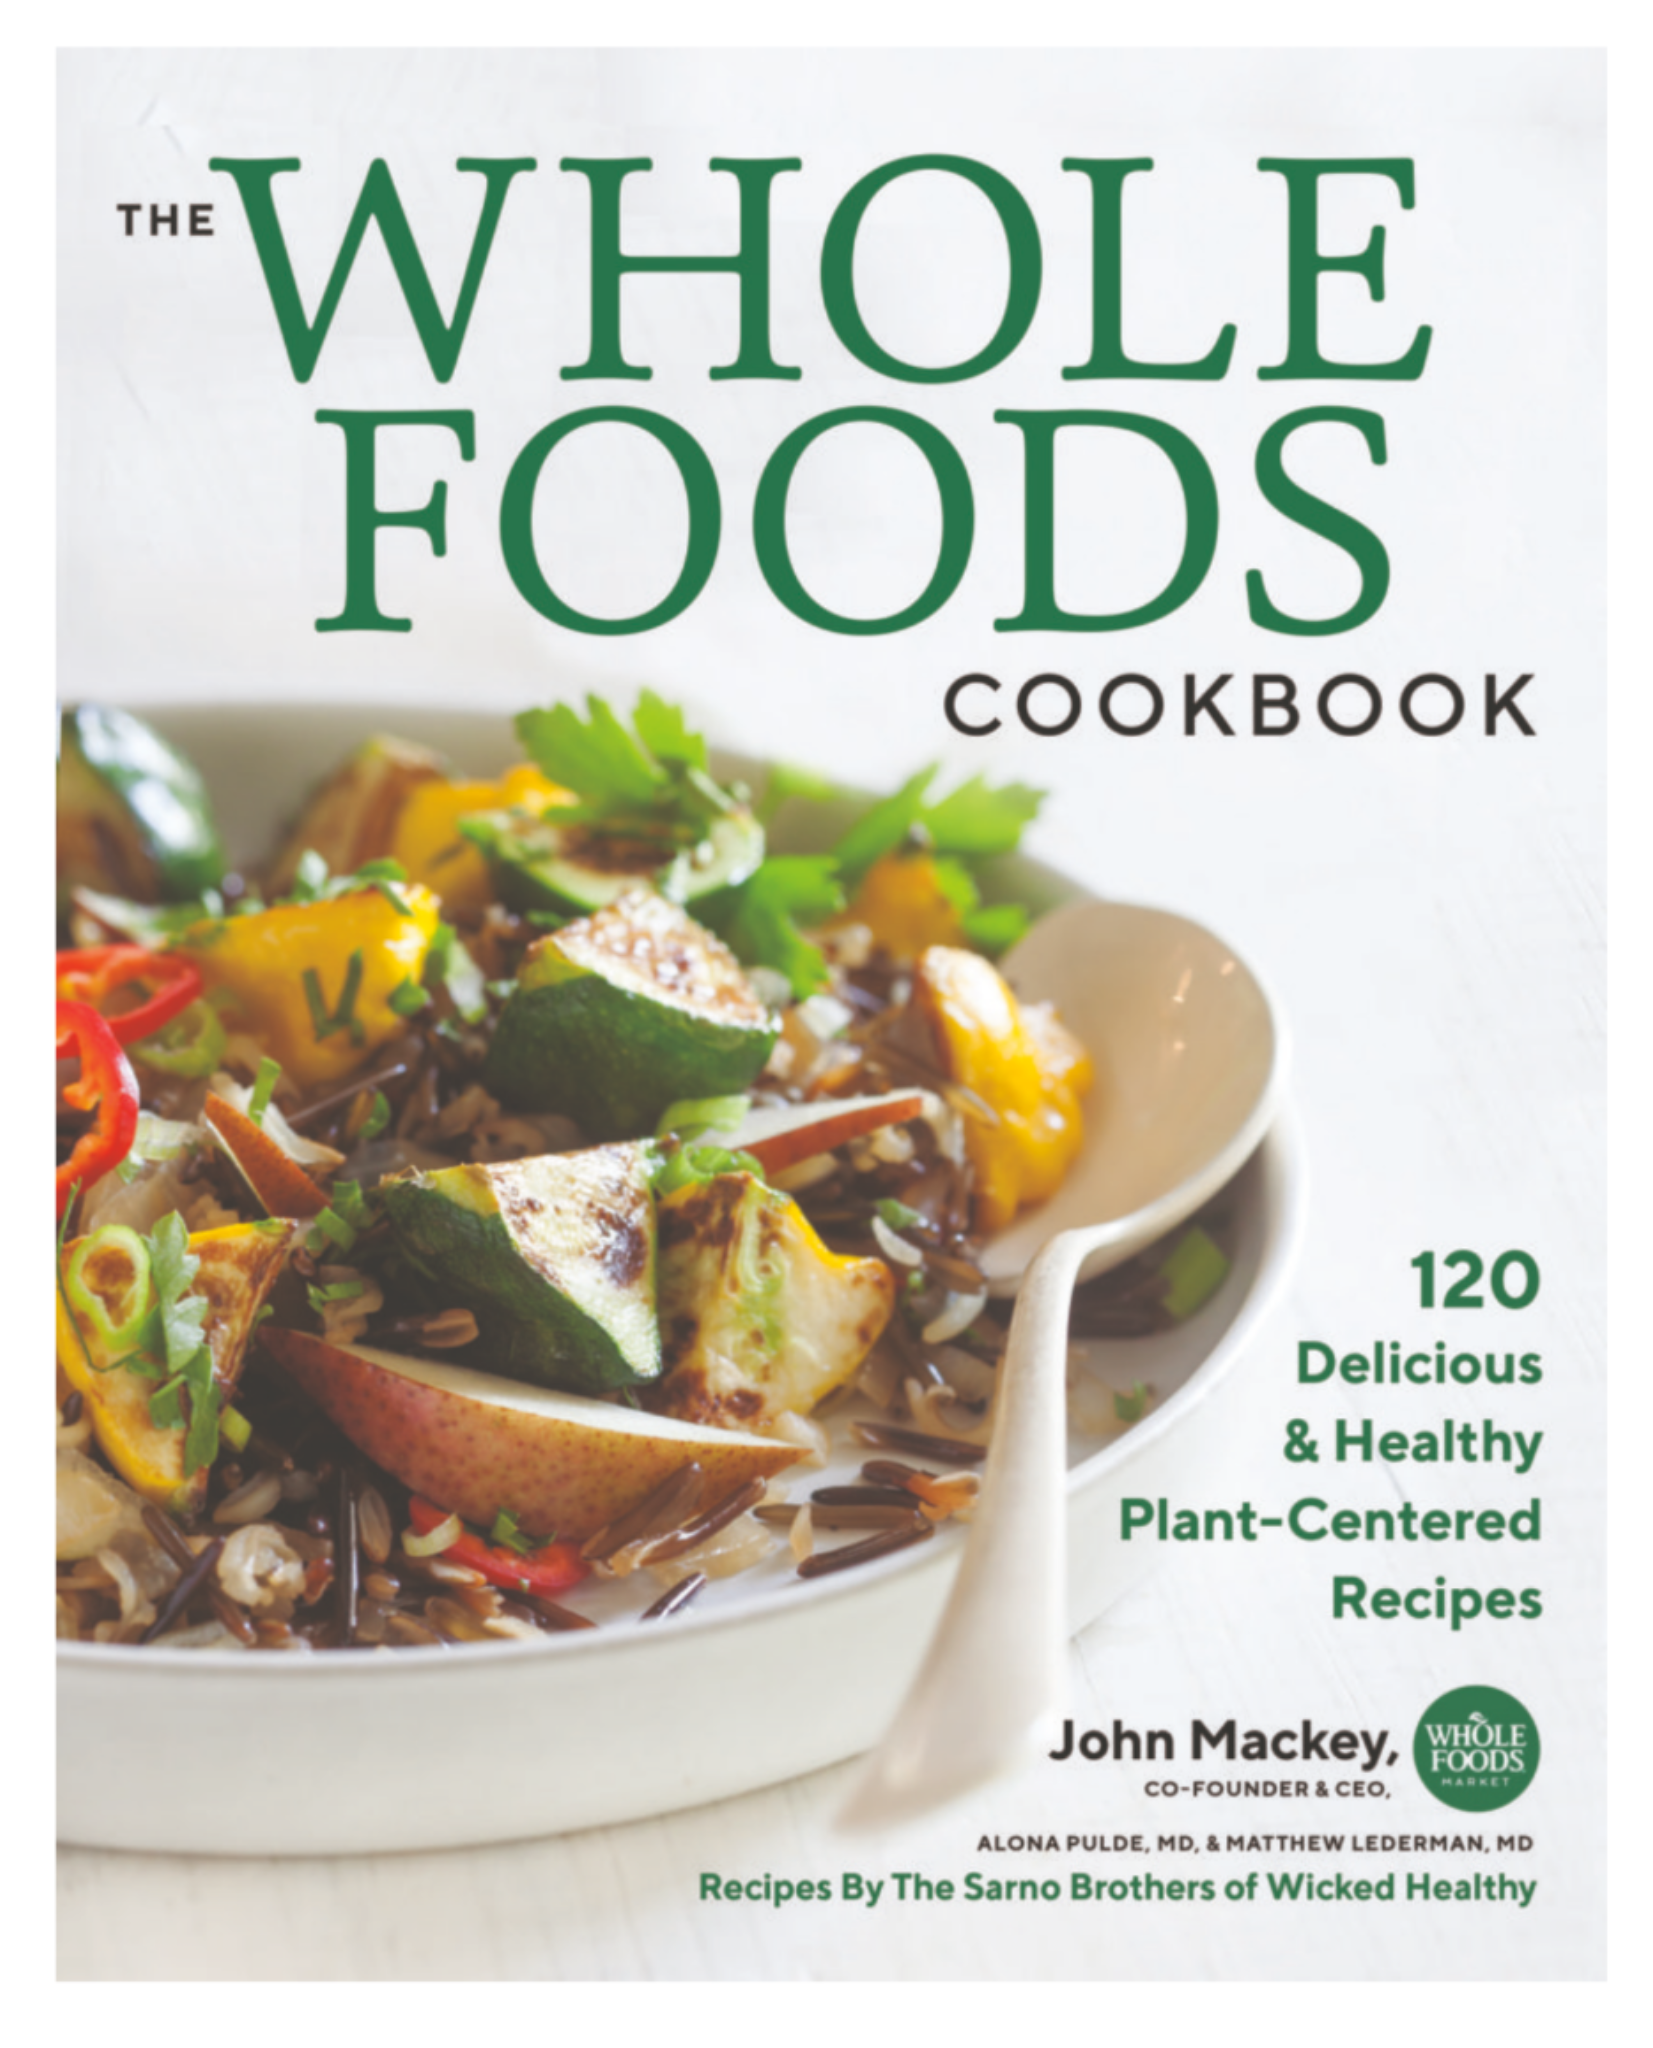 Photo: Ha Lam, Props: Maya Rossi for Whole Foods Cookbook